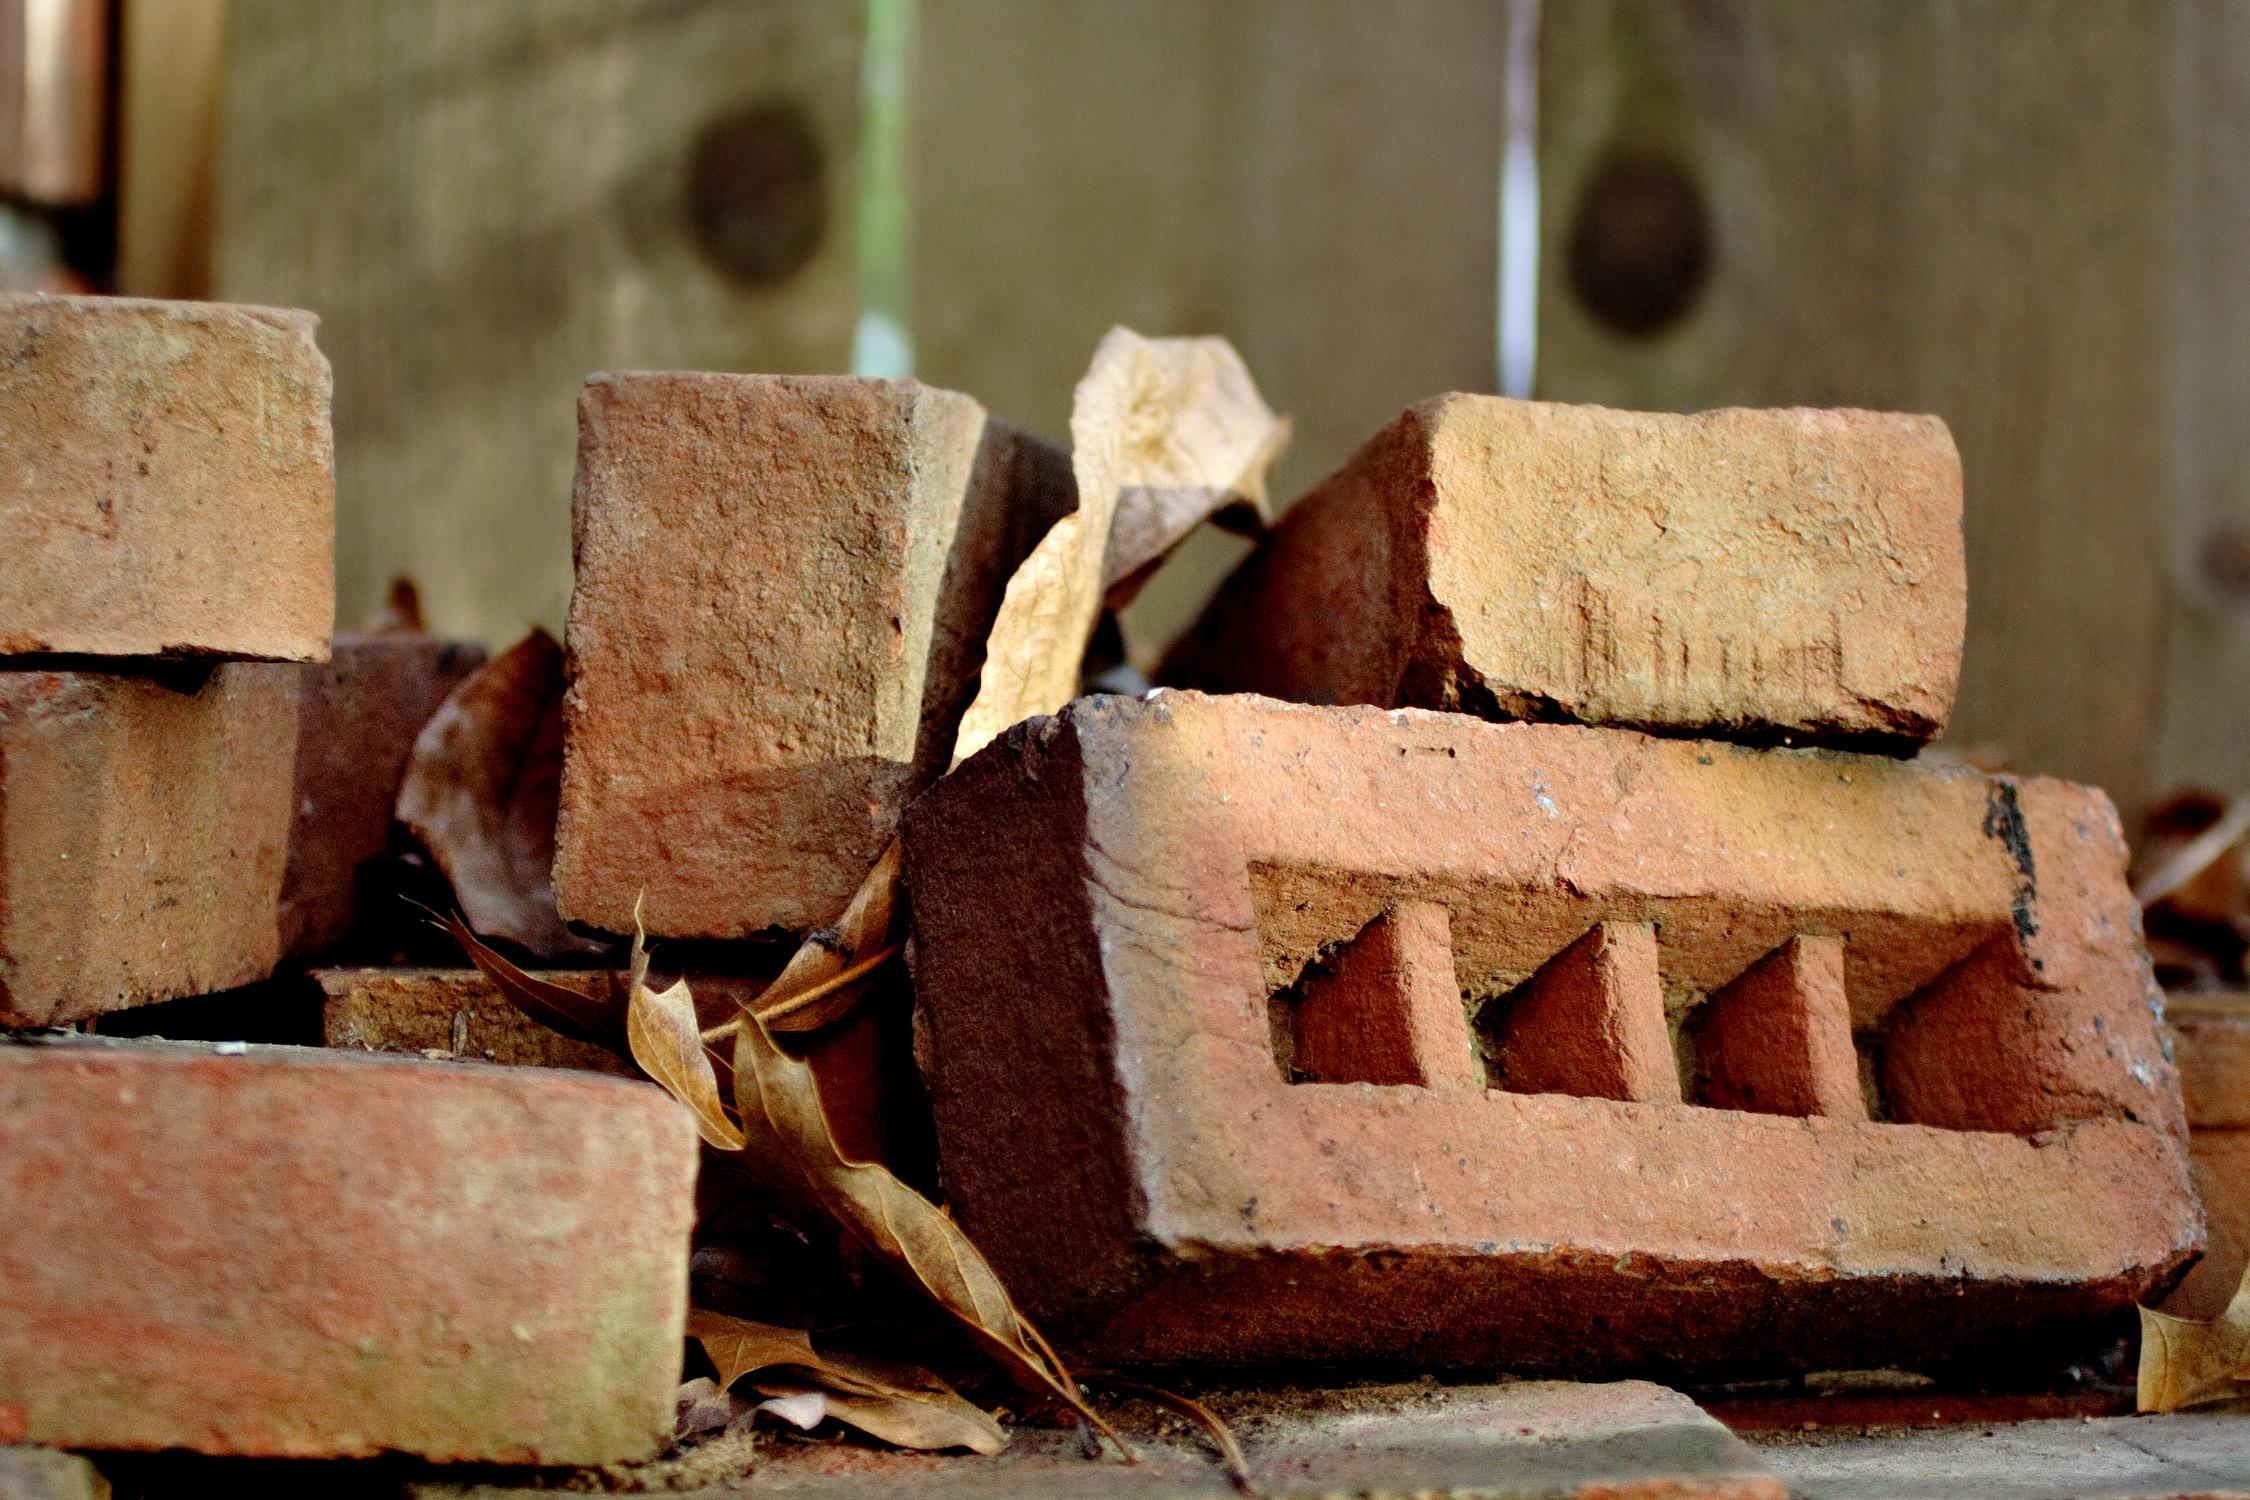 File:Brick pile.jpg - Wikipedia